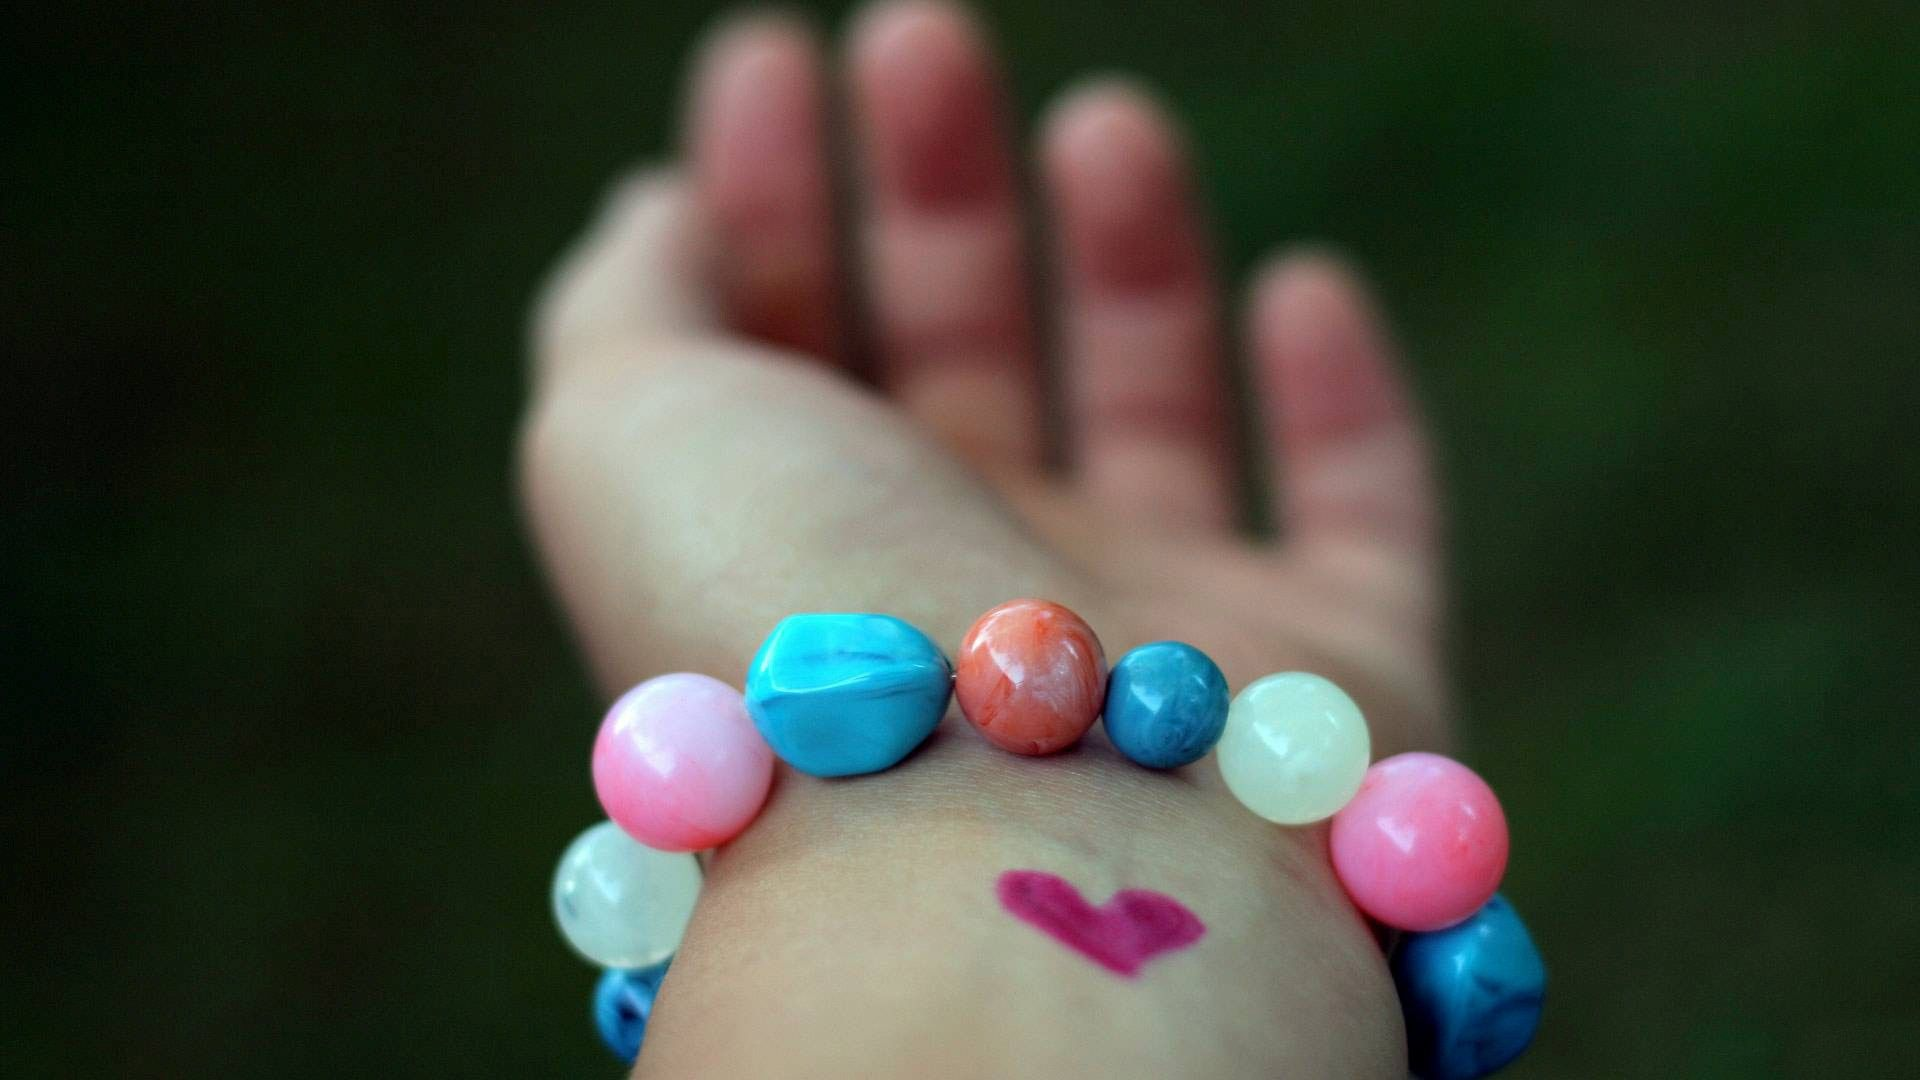 Love Symbol in Hand HD Wallpapers | Love Heart | Pinterest | Hd ...